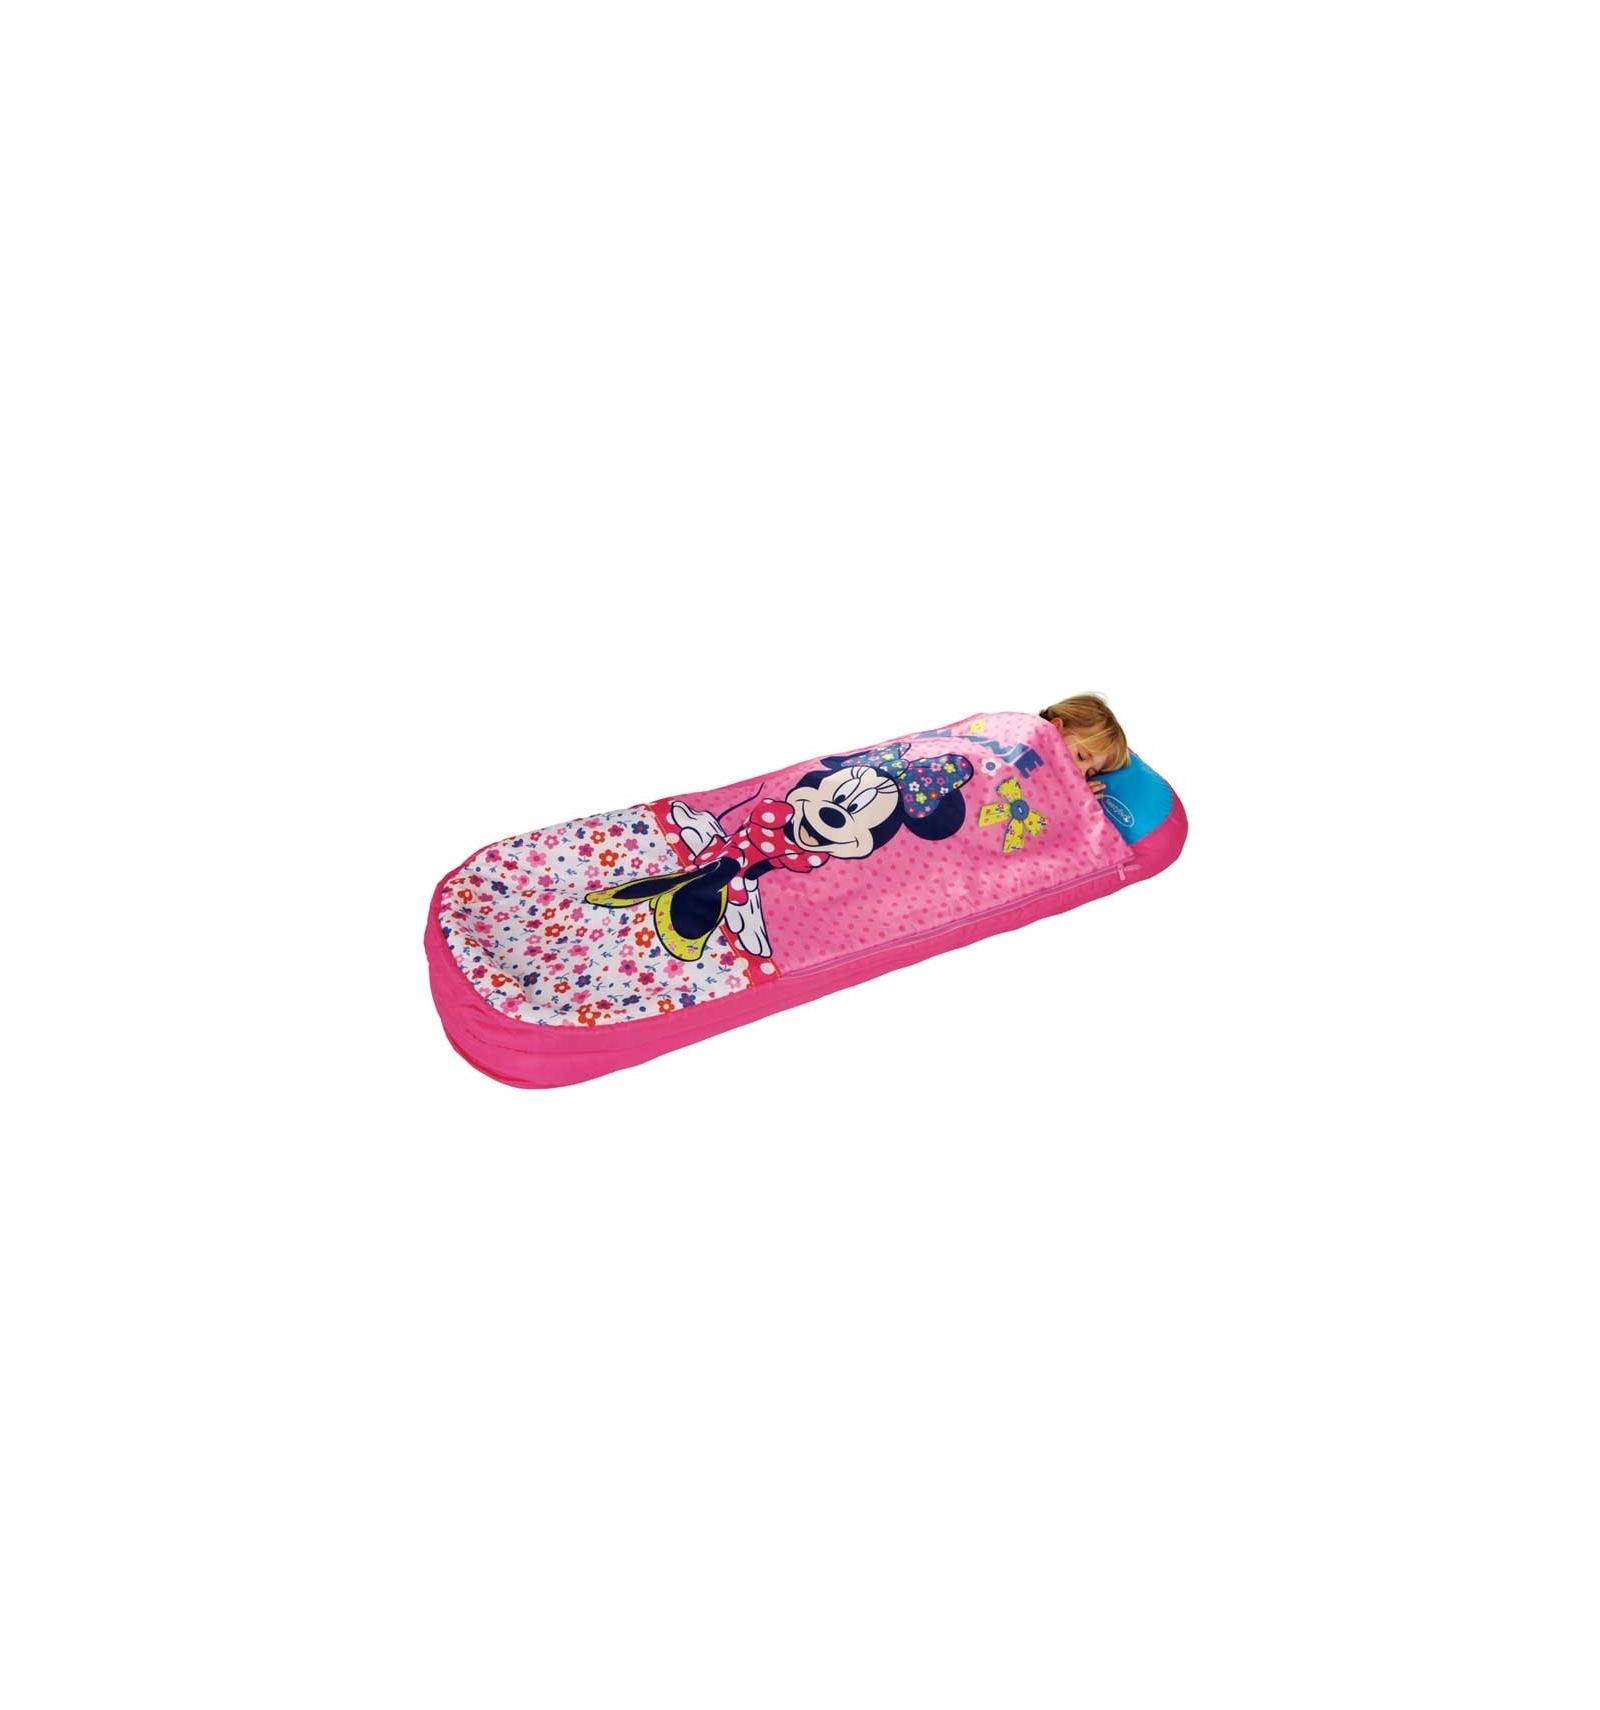 Camper Bett Minnie Mouse